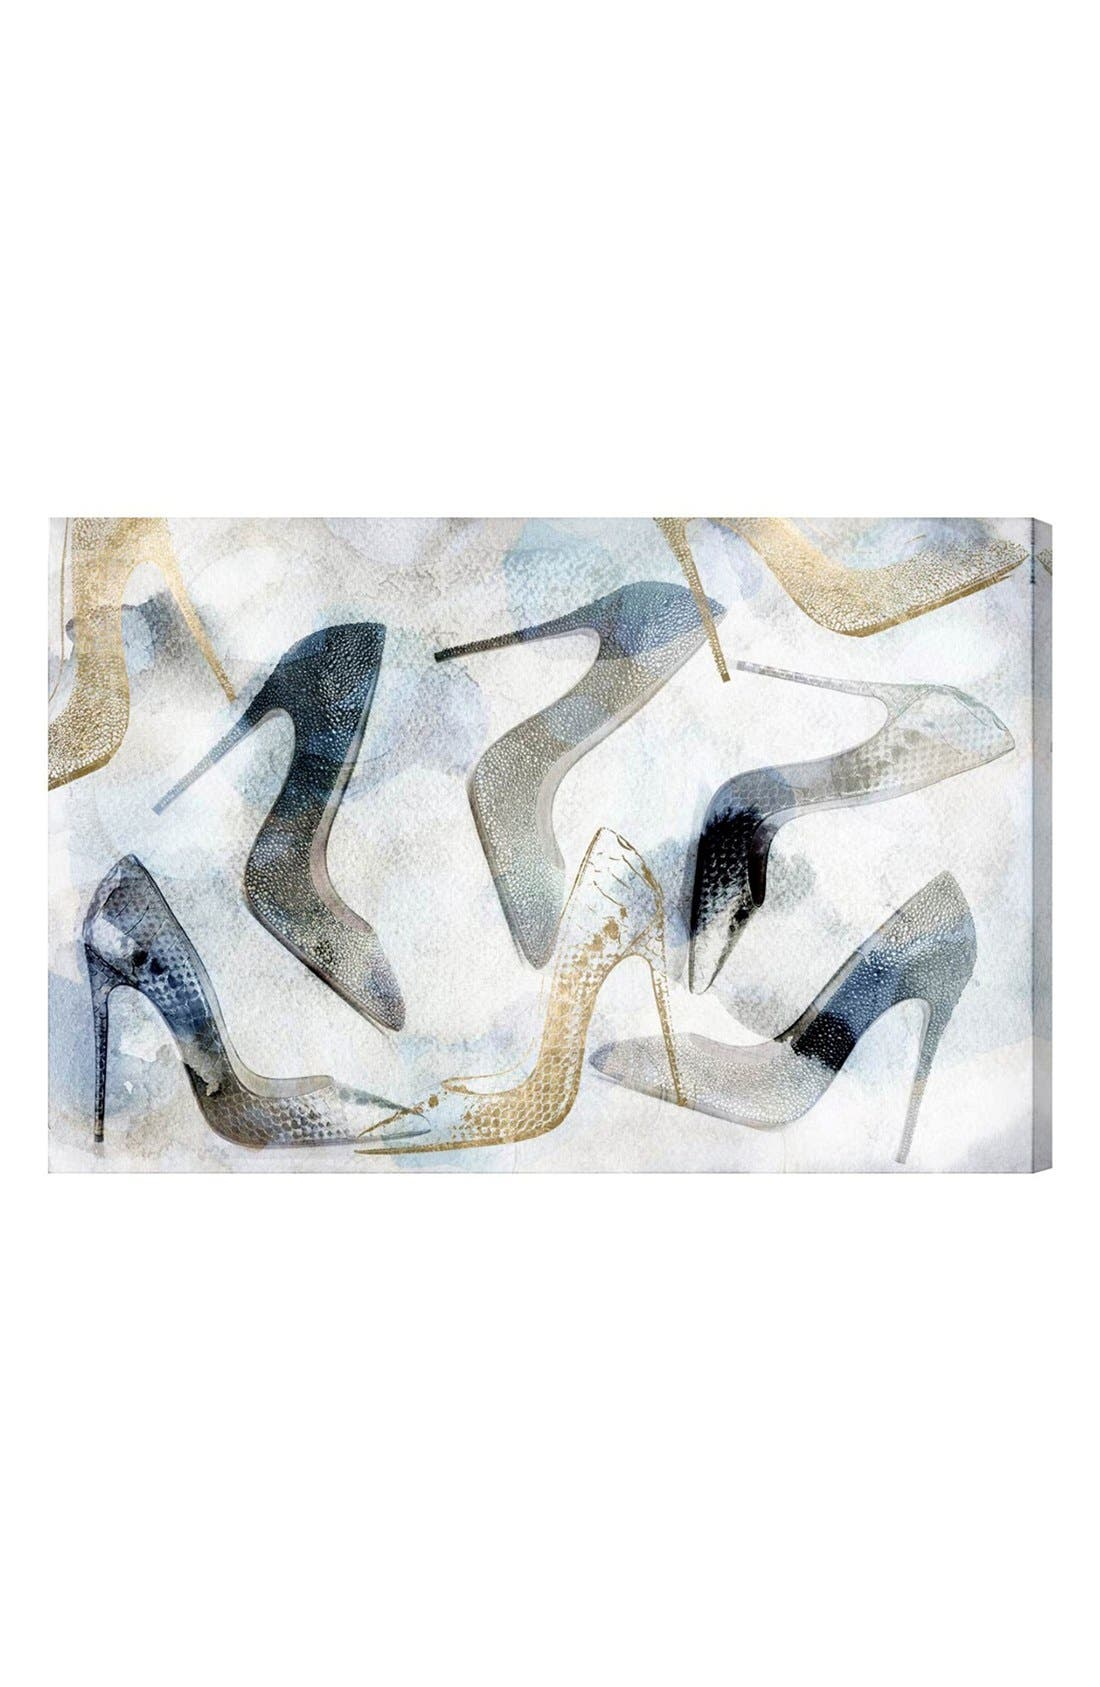 Oliver Gal 'Bianca' Canvas Wall Art